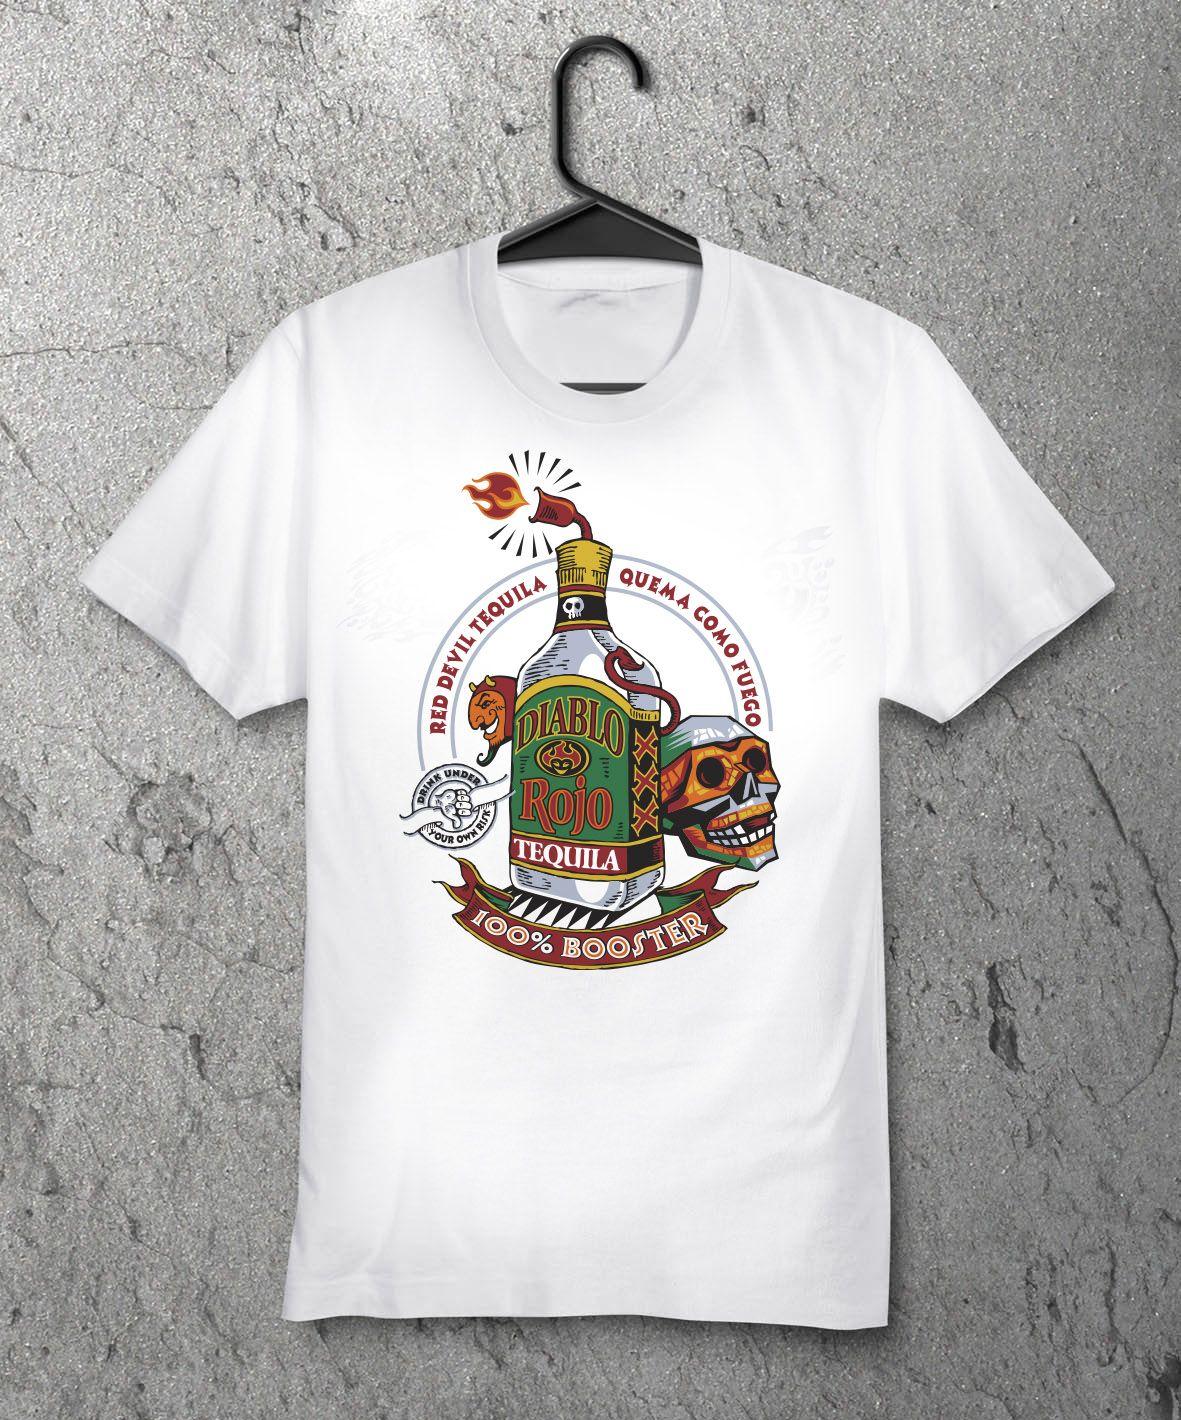 t shirt designs mexico t sssss pinterest